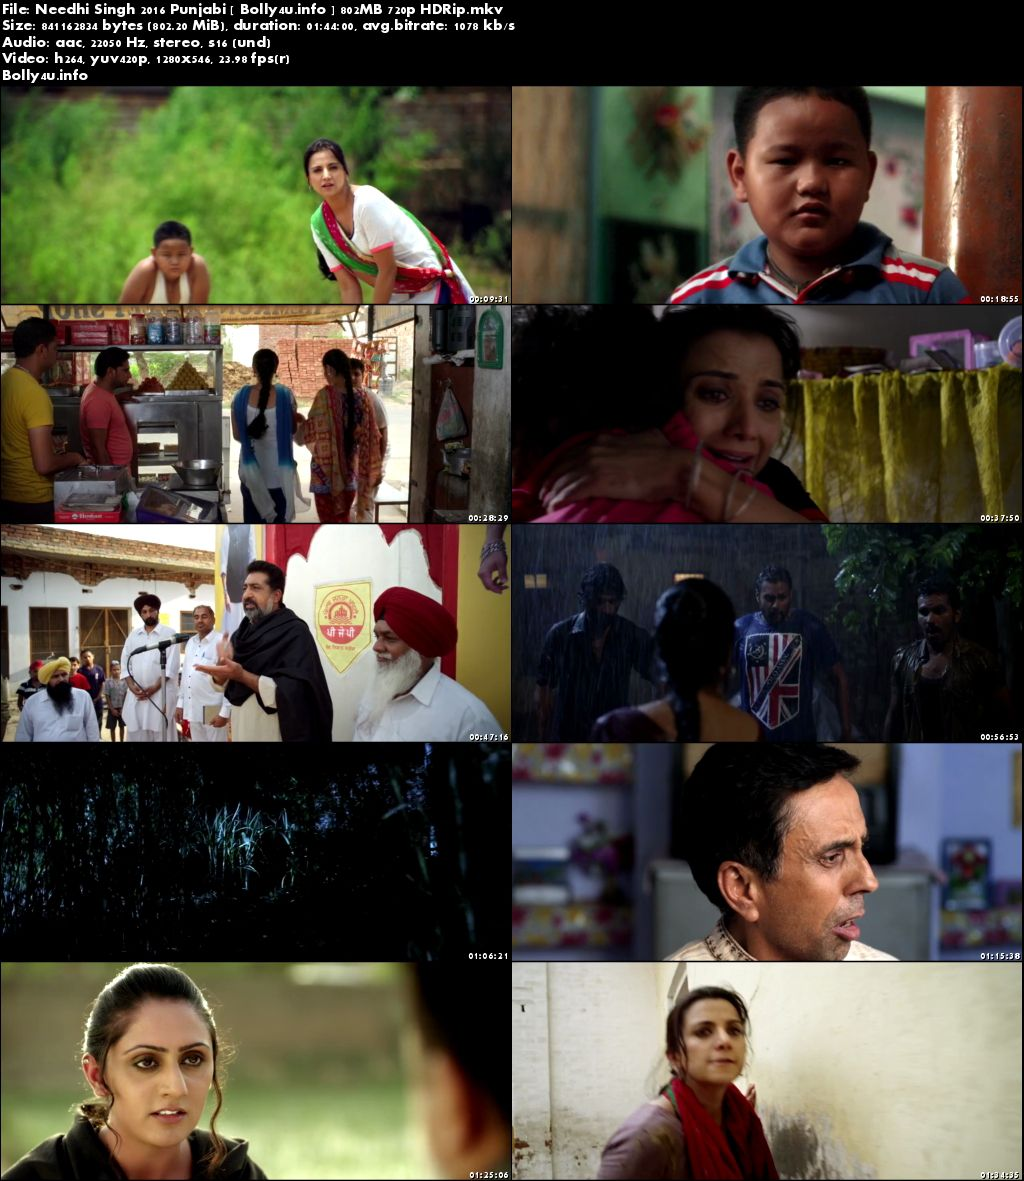 Screen Shoots of Watch Online Needhi Singh 2016 HDRip 300MB Punjabi Movie 480p Free Download Bolly4u.info